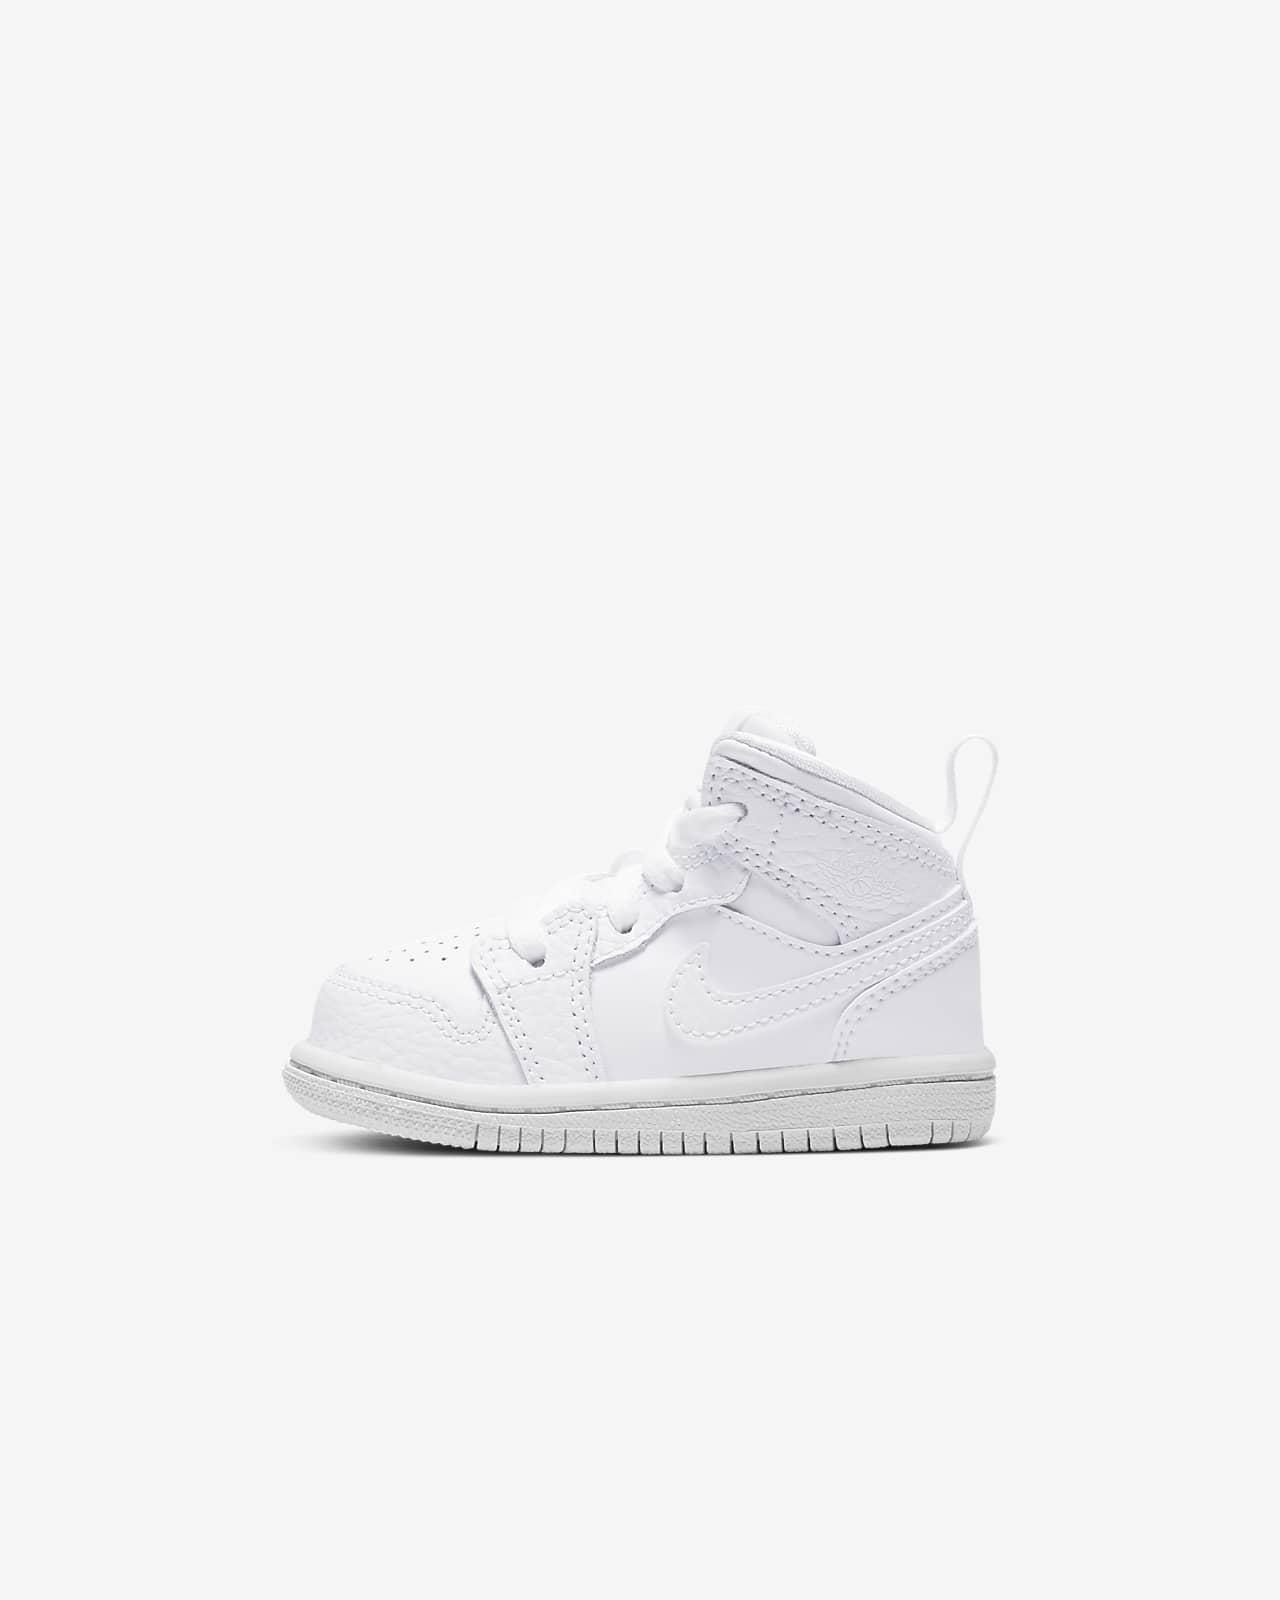 Jordan 1 Mid Baby and Toddler Shoe. Nike CA